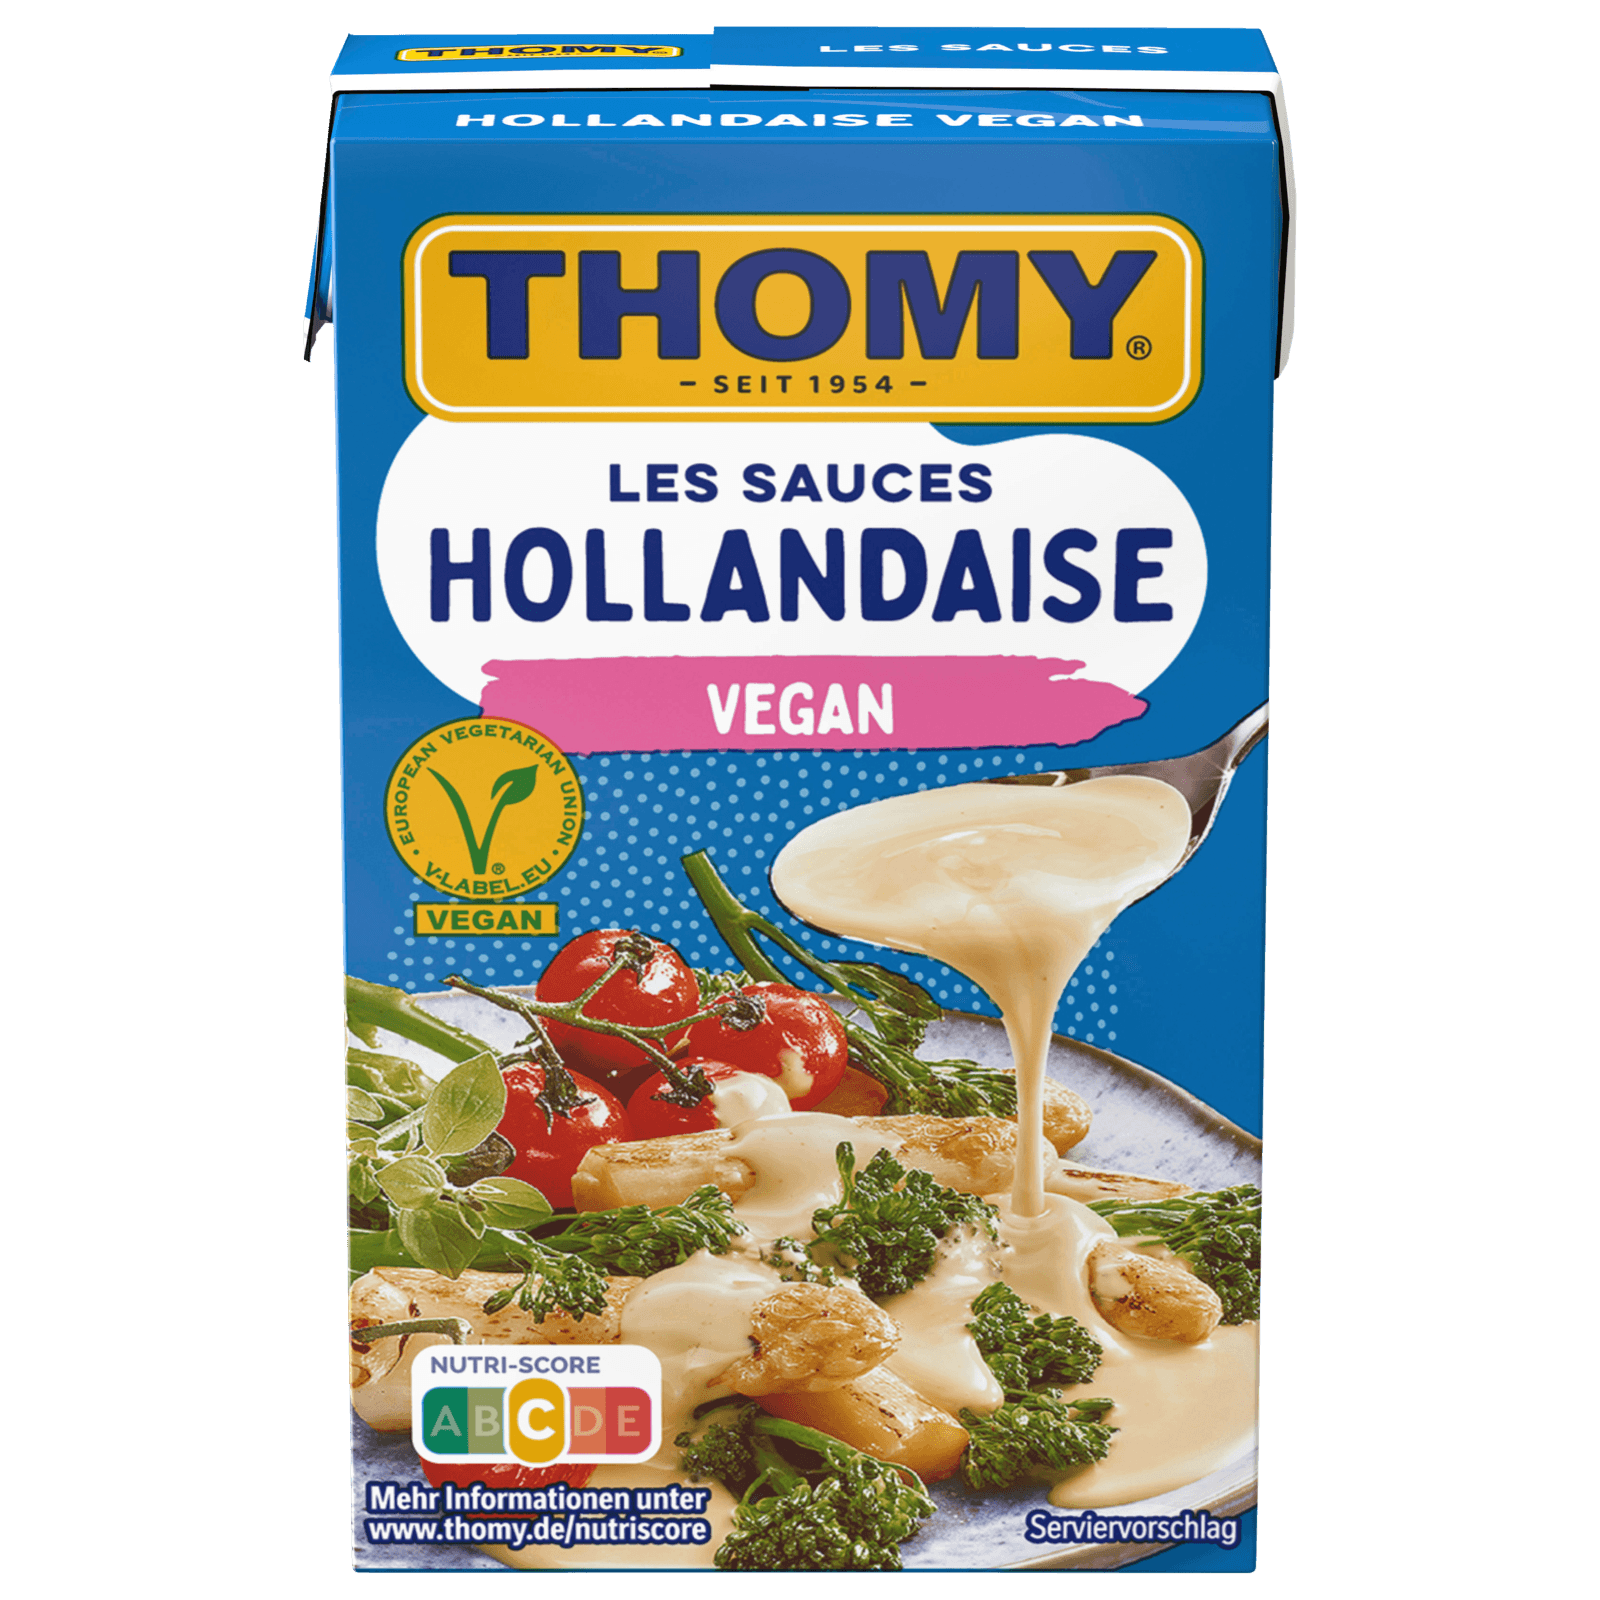 Thomy Les Sauces Hollandaise Vegan 250ml Bei Rewe Online Bestellen